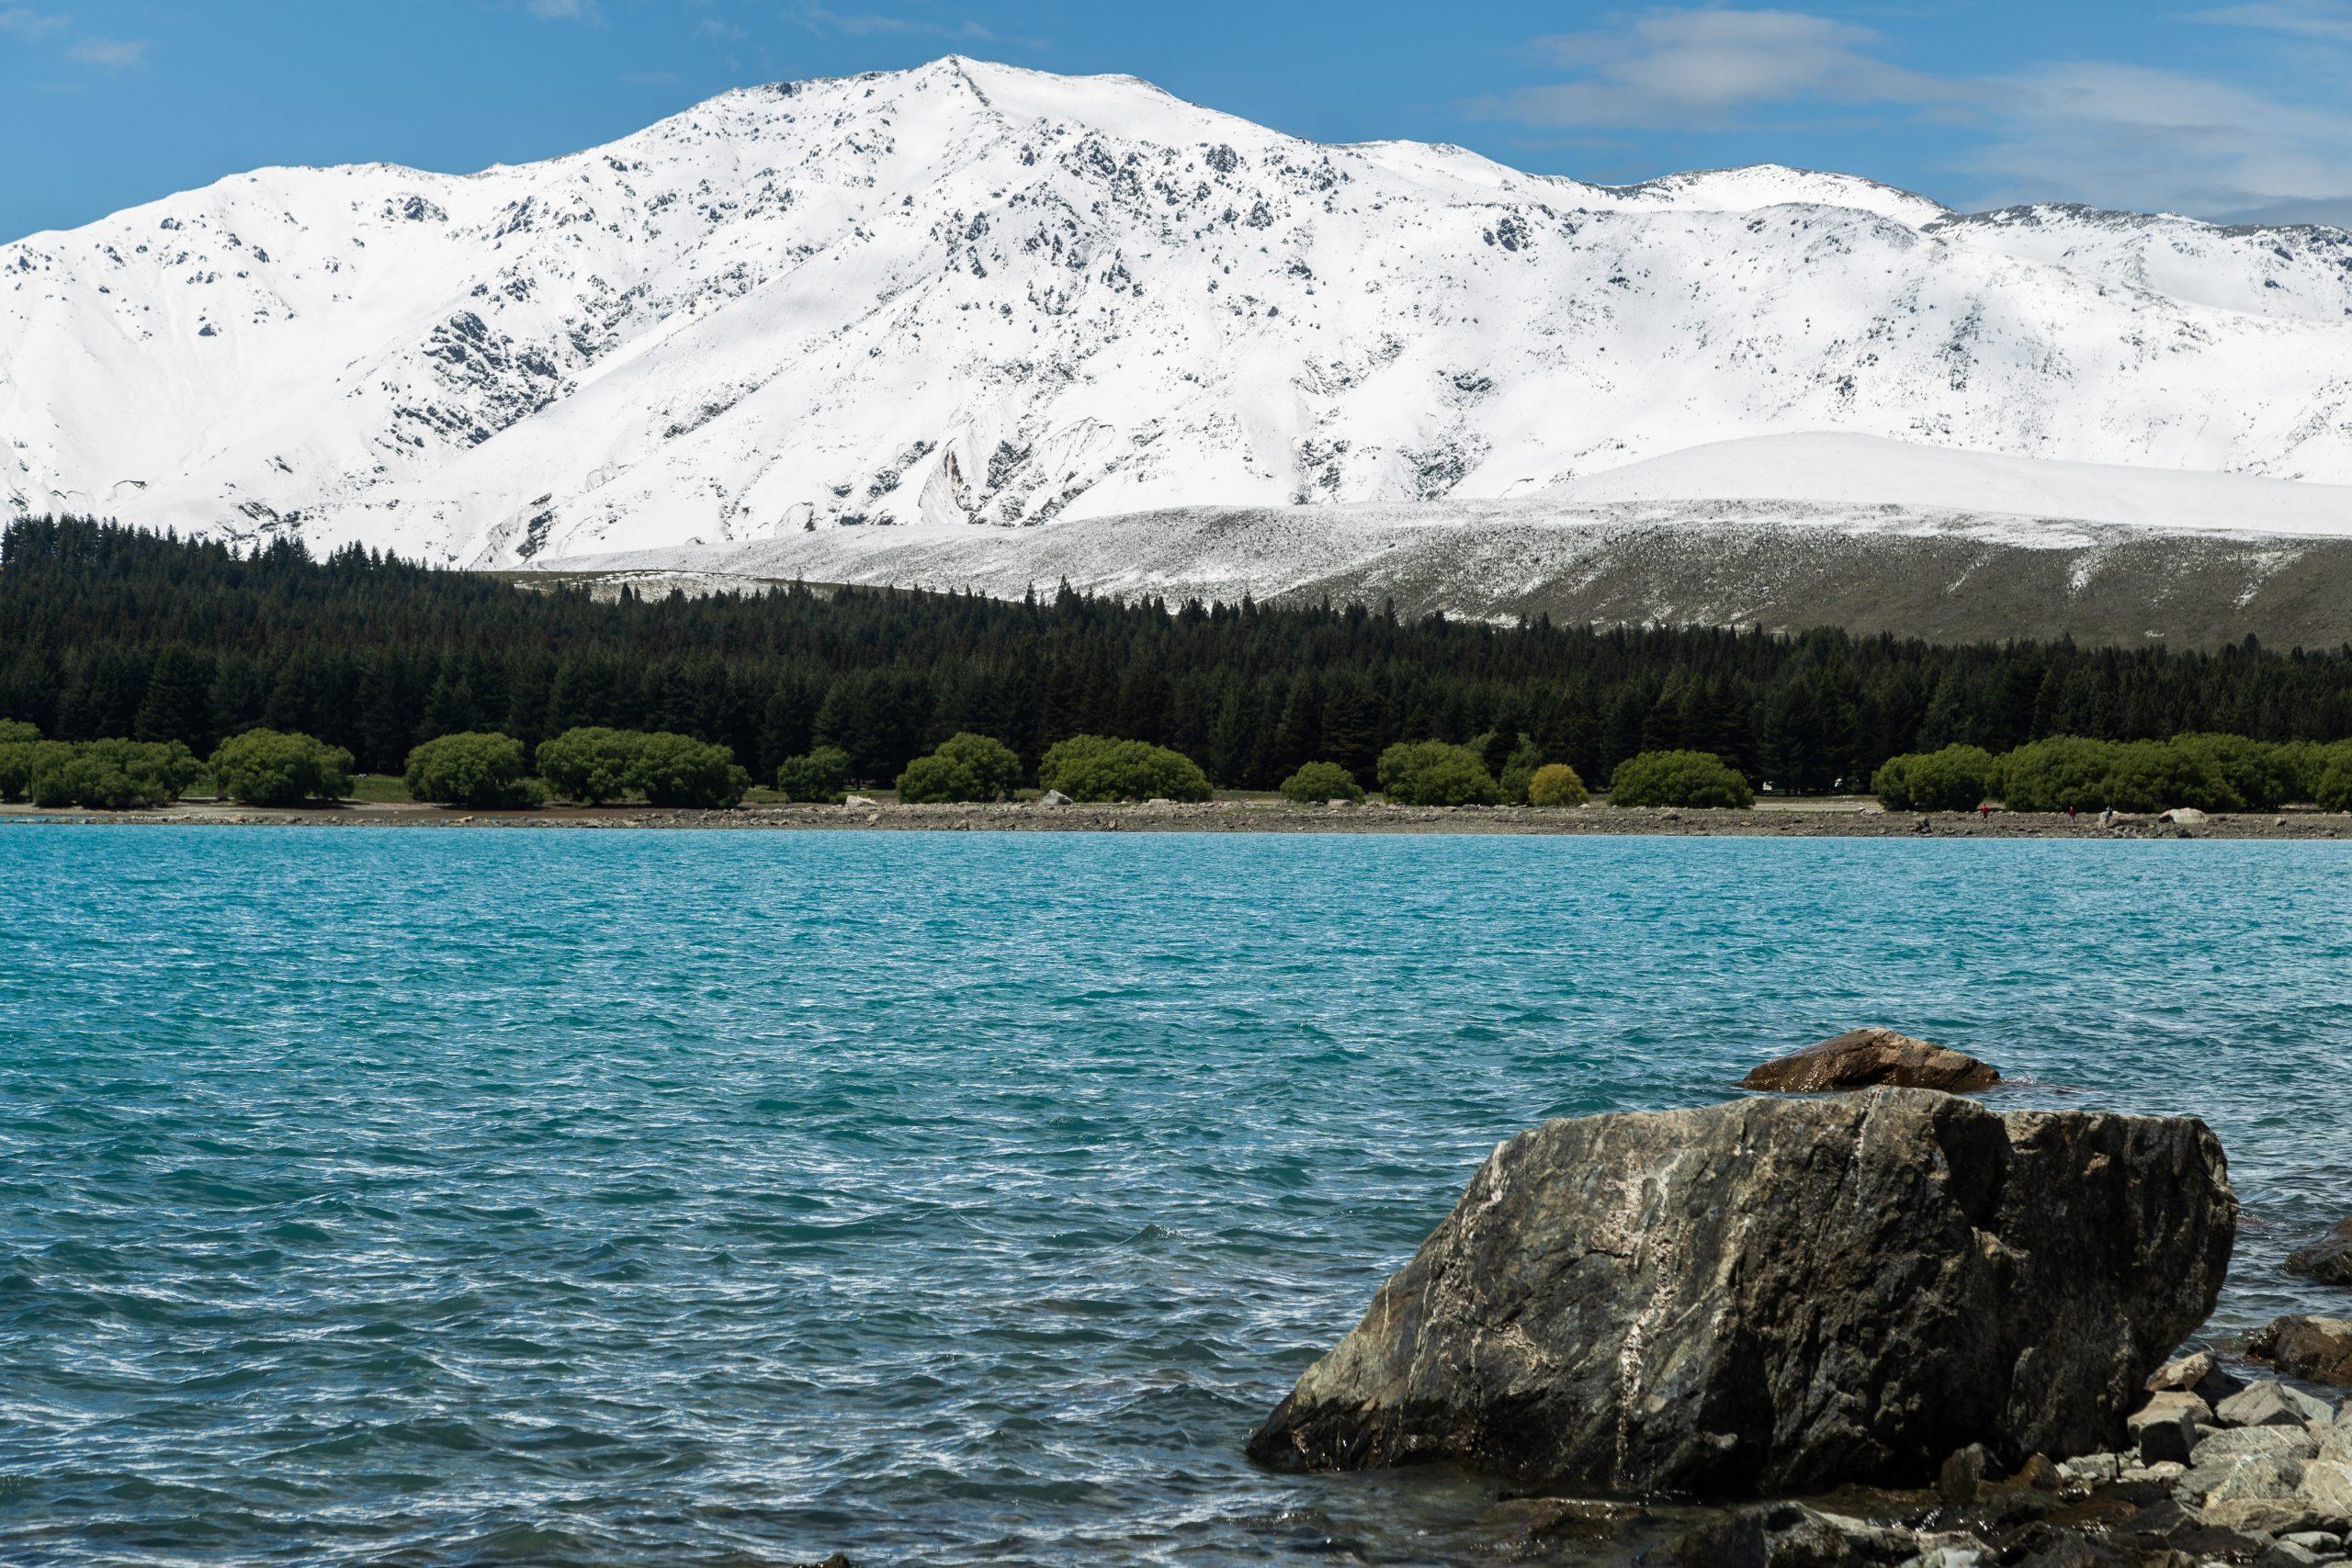 Glacier behind turquoise lake